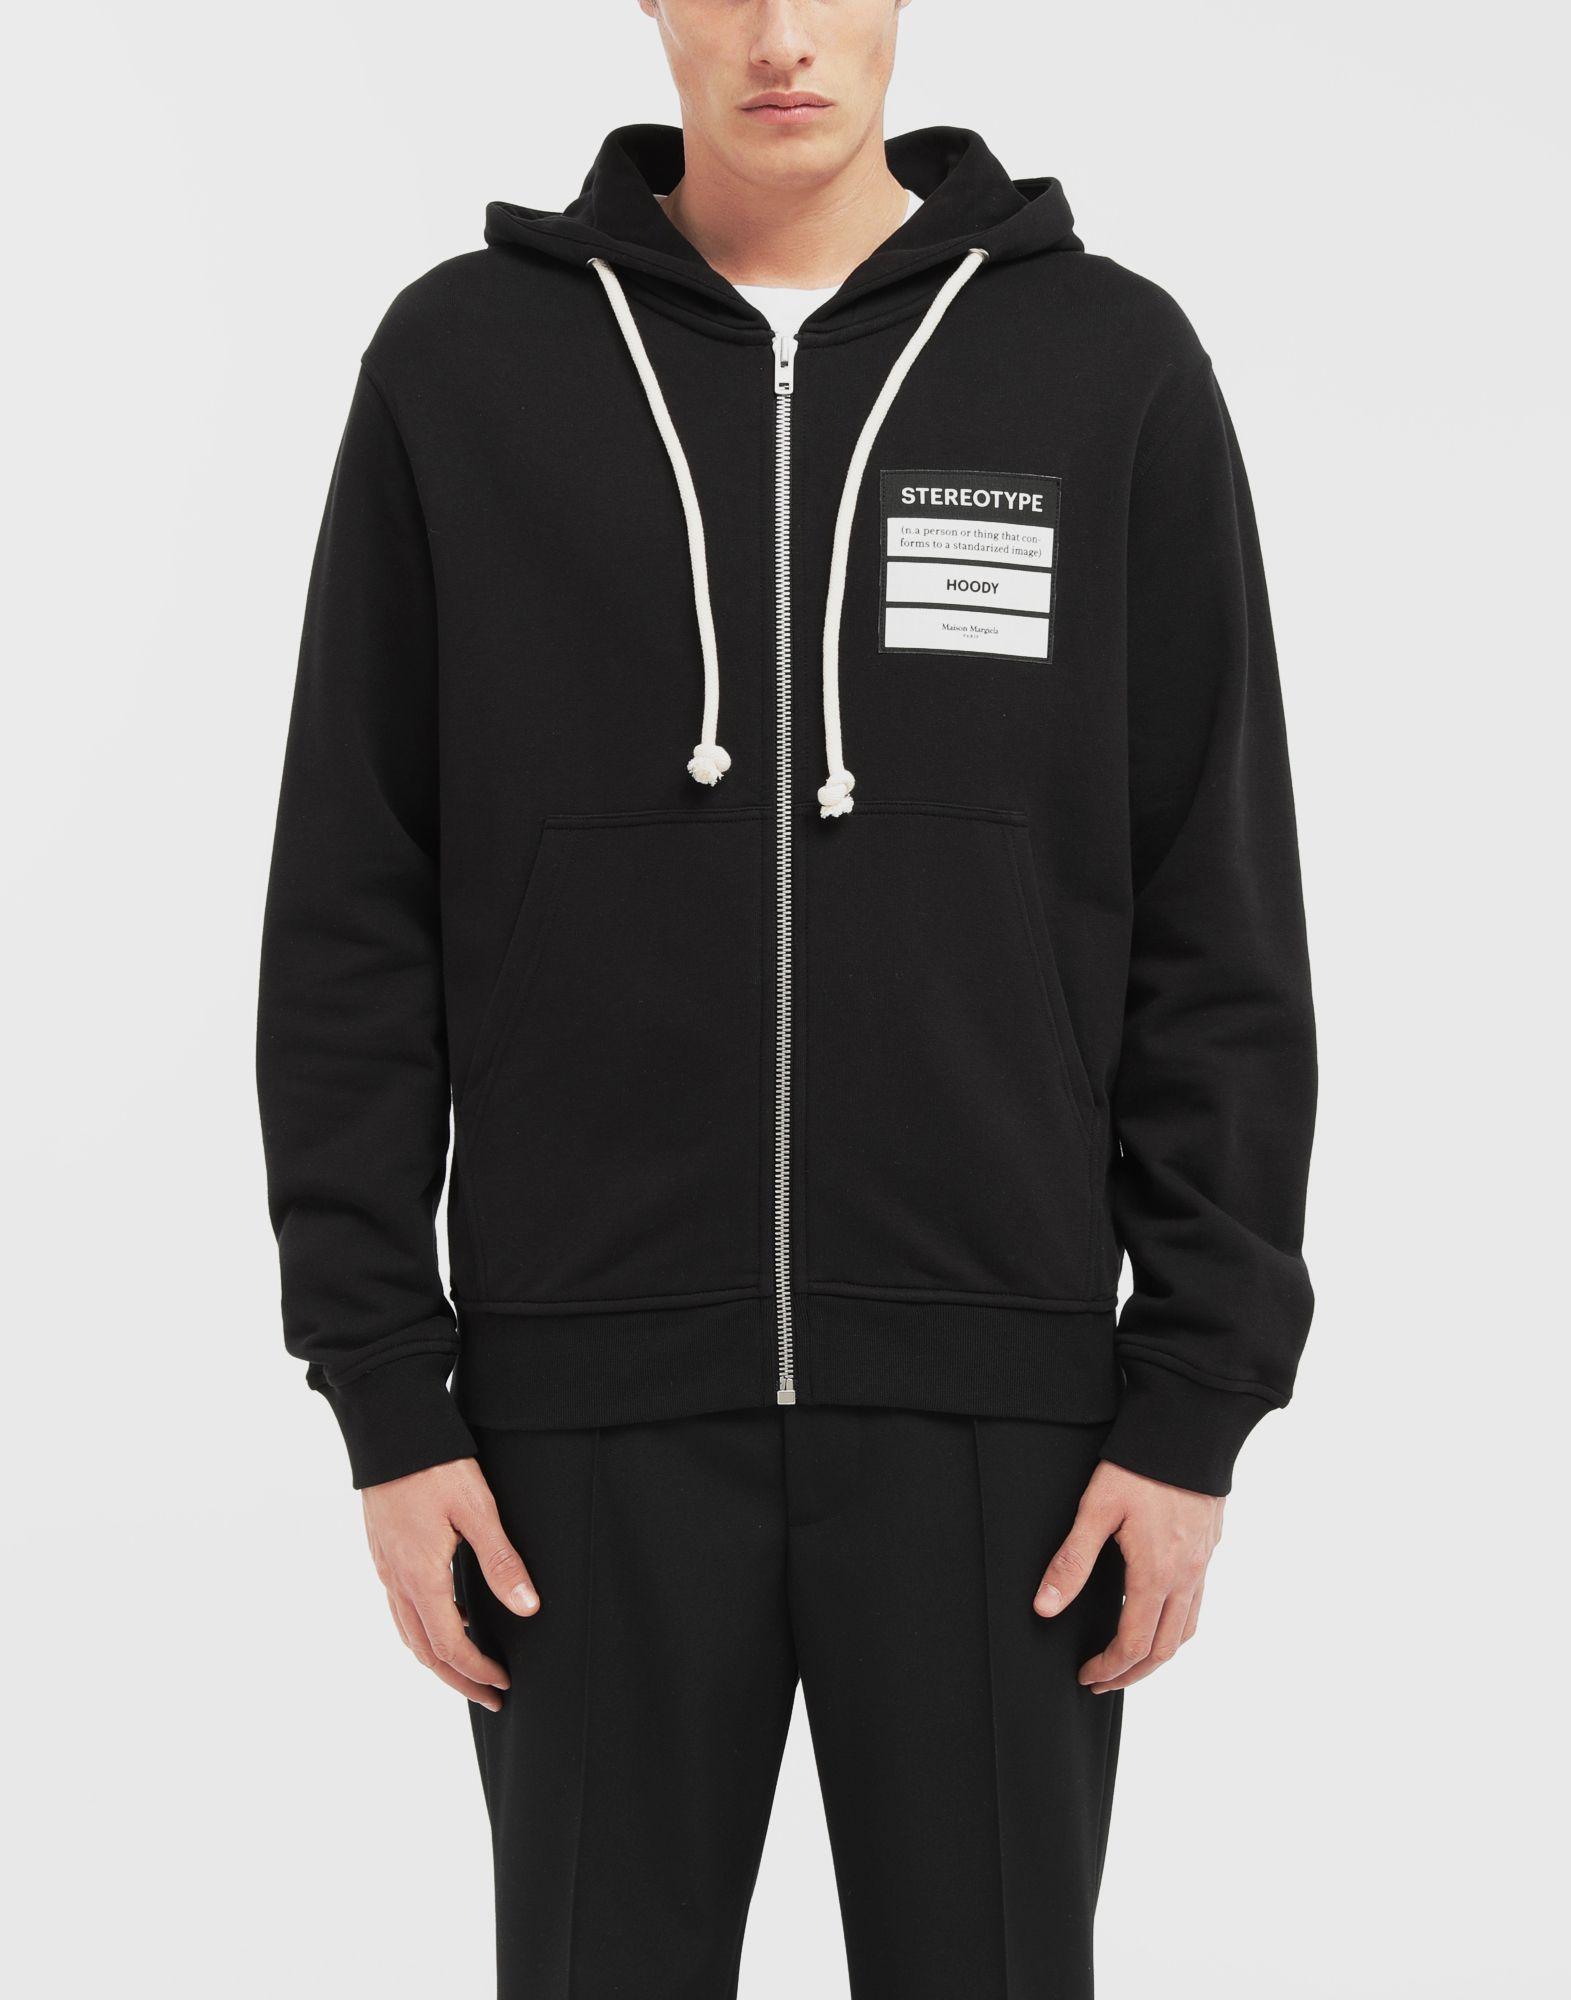 MAISON MARGIELA Stereotype hooded sweatshirt Sweatshirt Man r